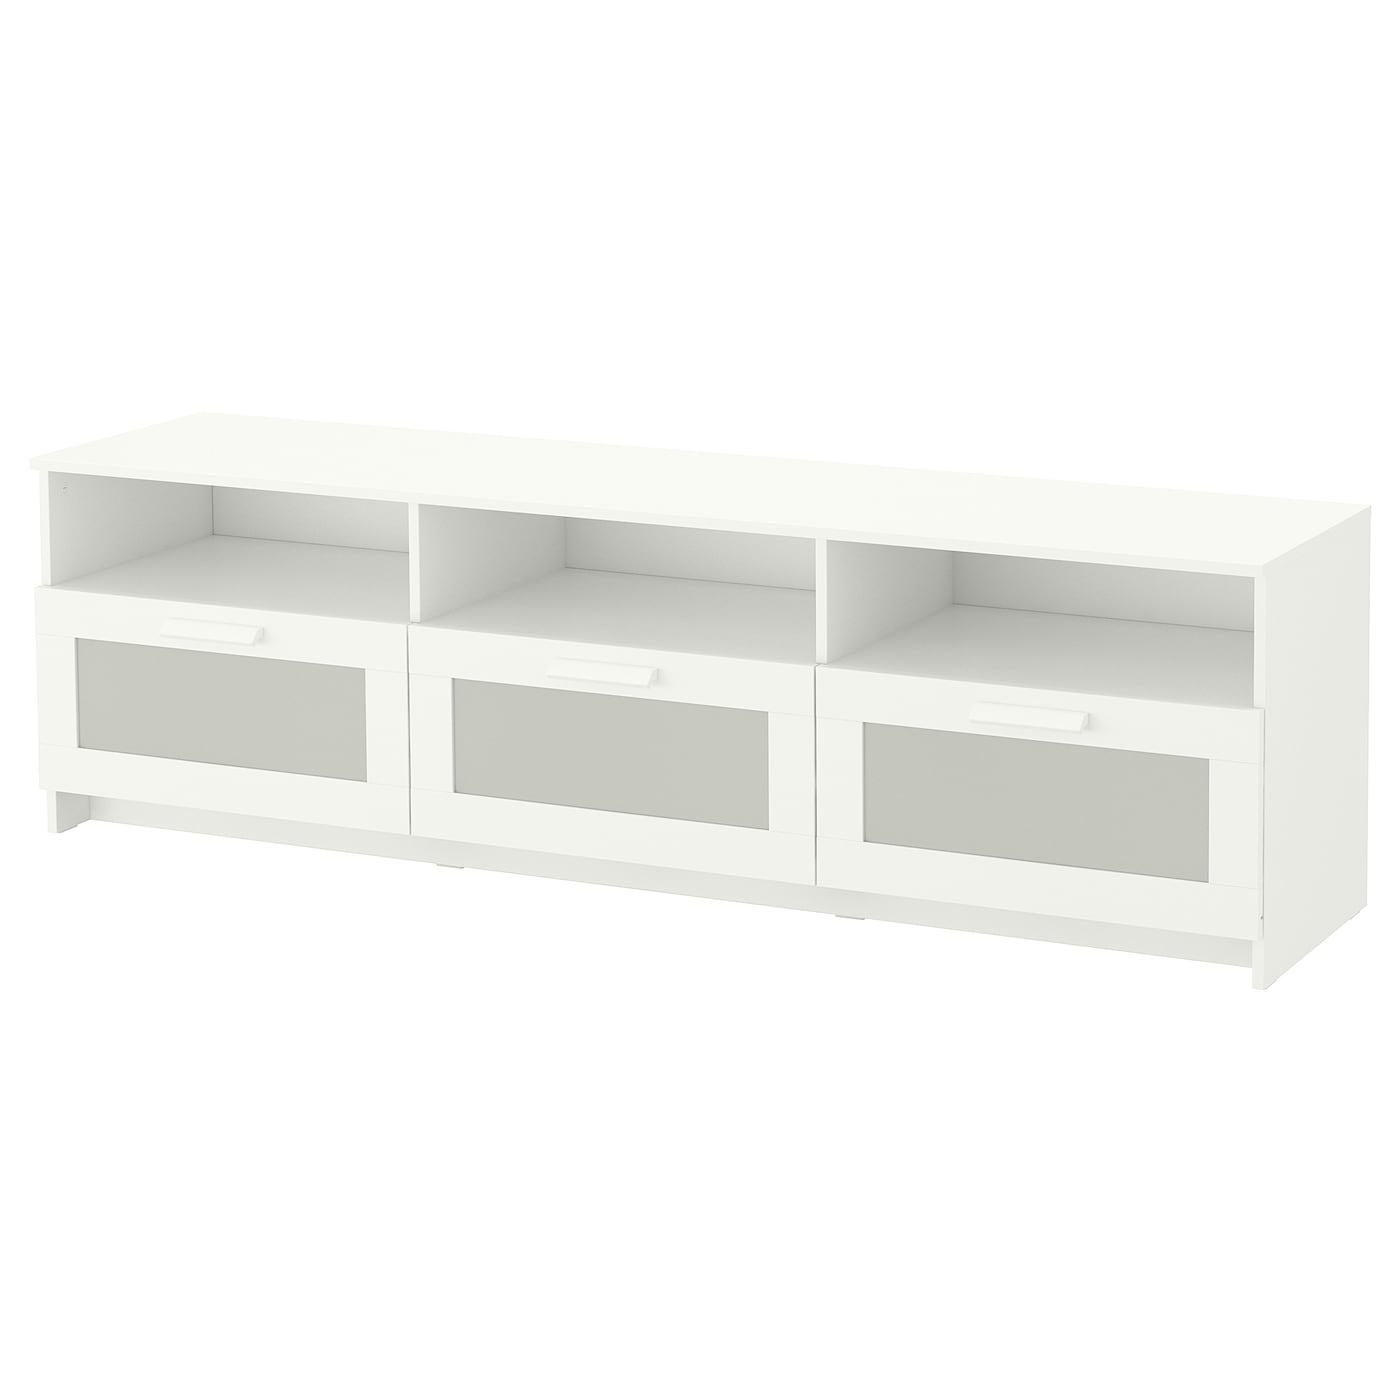 IKEA - BRIMNES Tv-meubel - 180x41x53 cm - Wit